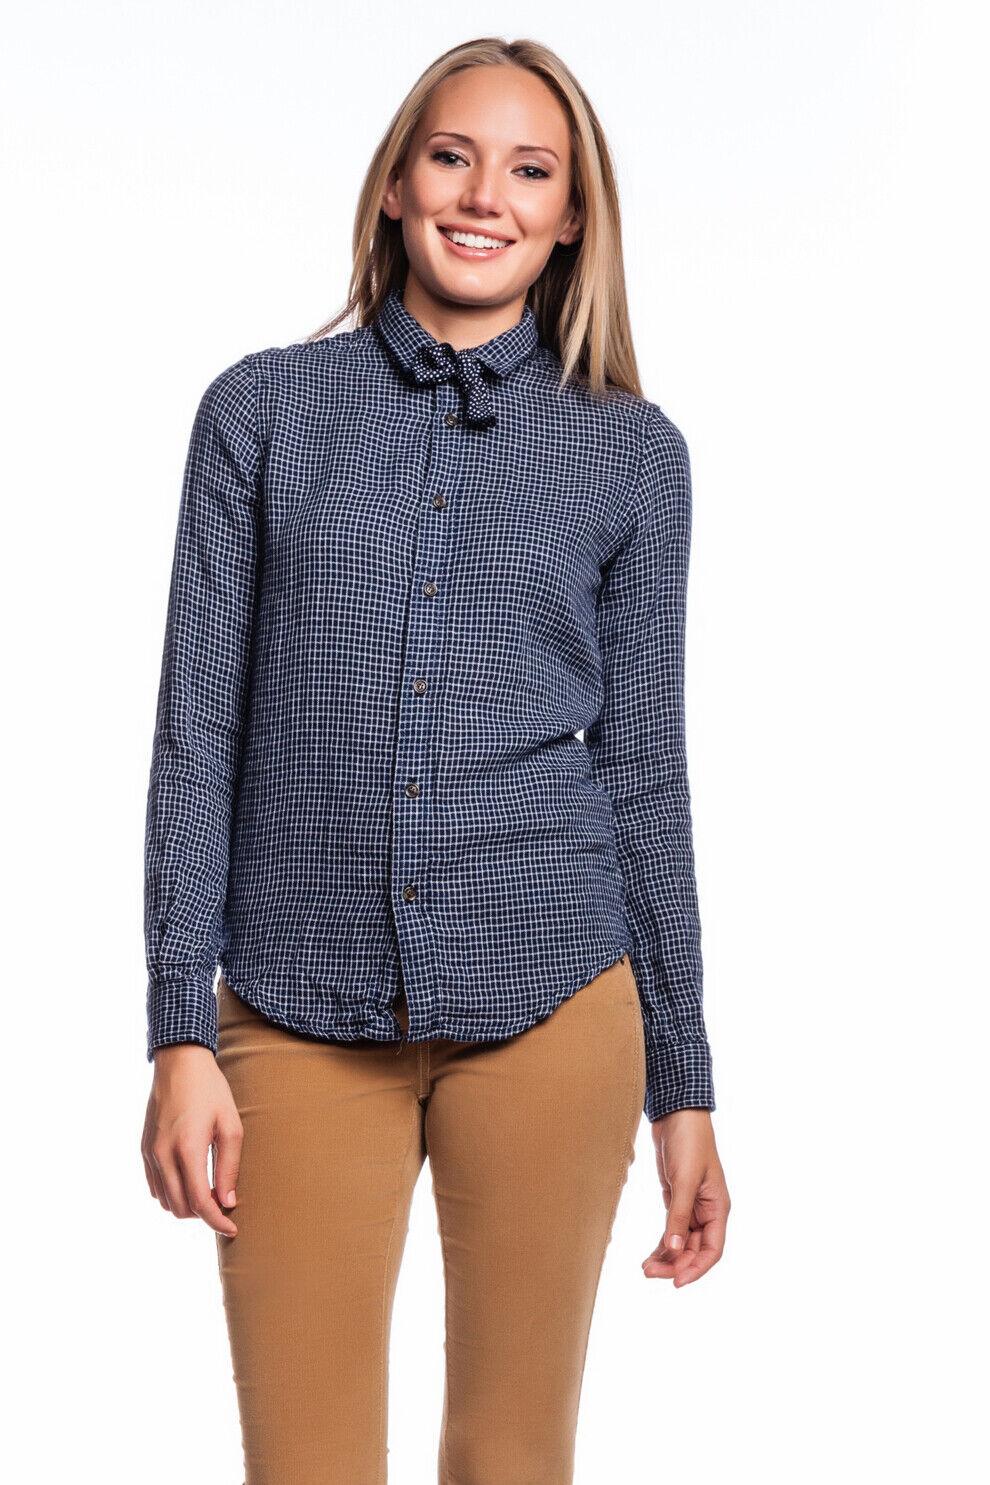 J.A.C.H.S. Lucy Shirt Blau Long Sleeves JACHS New Checkerot Button Down damen